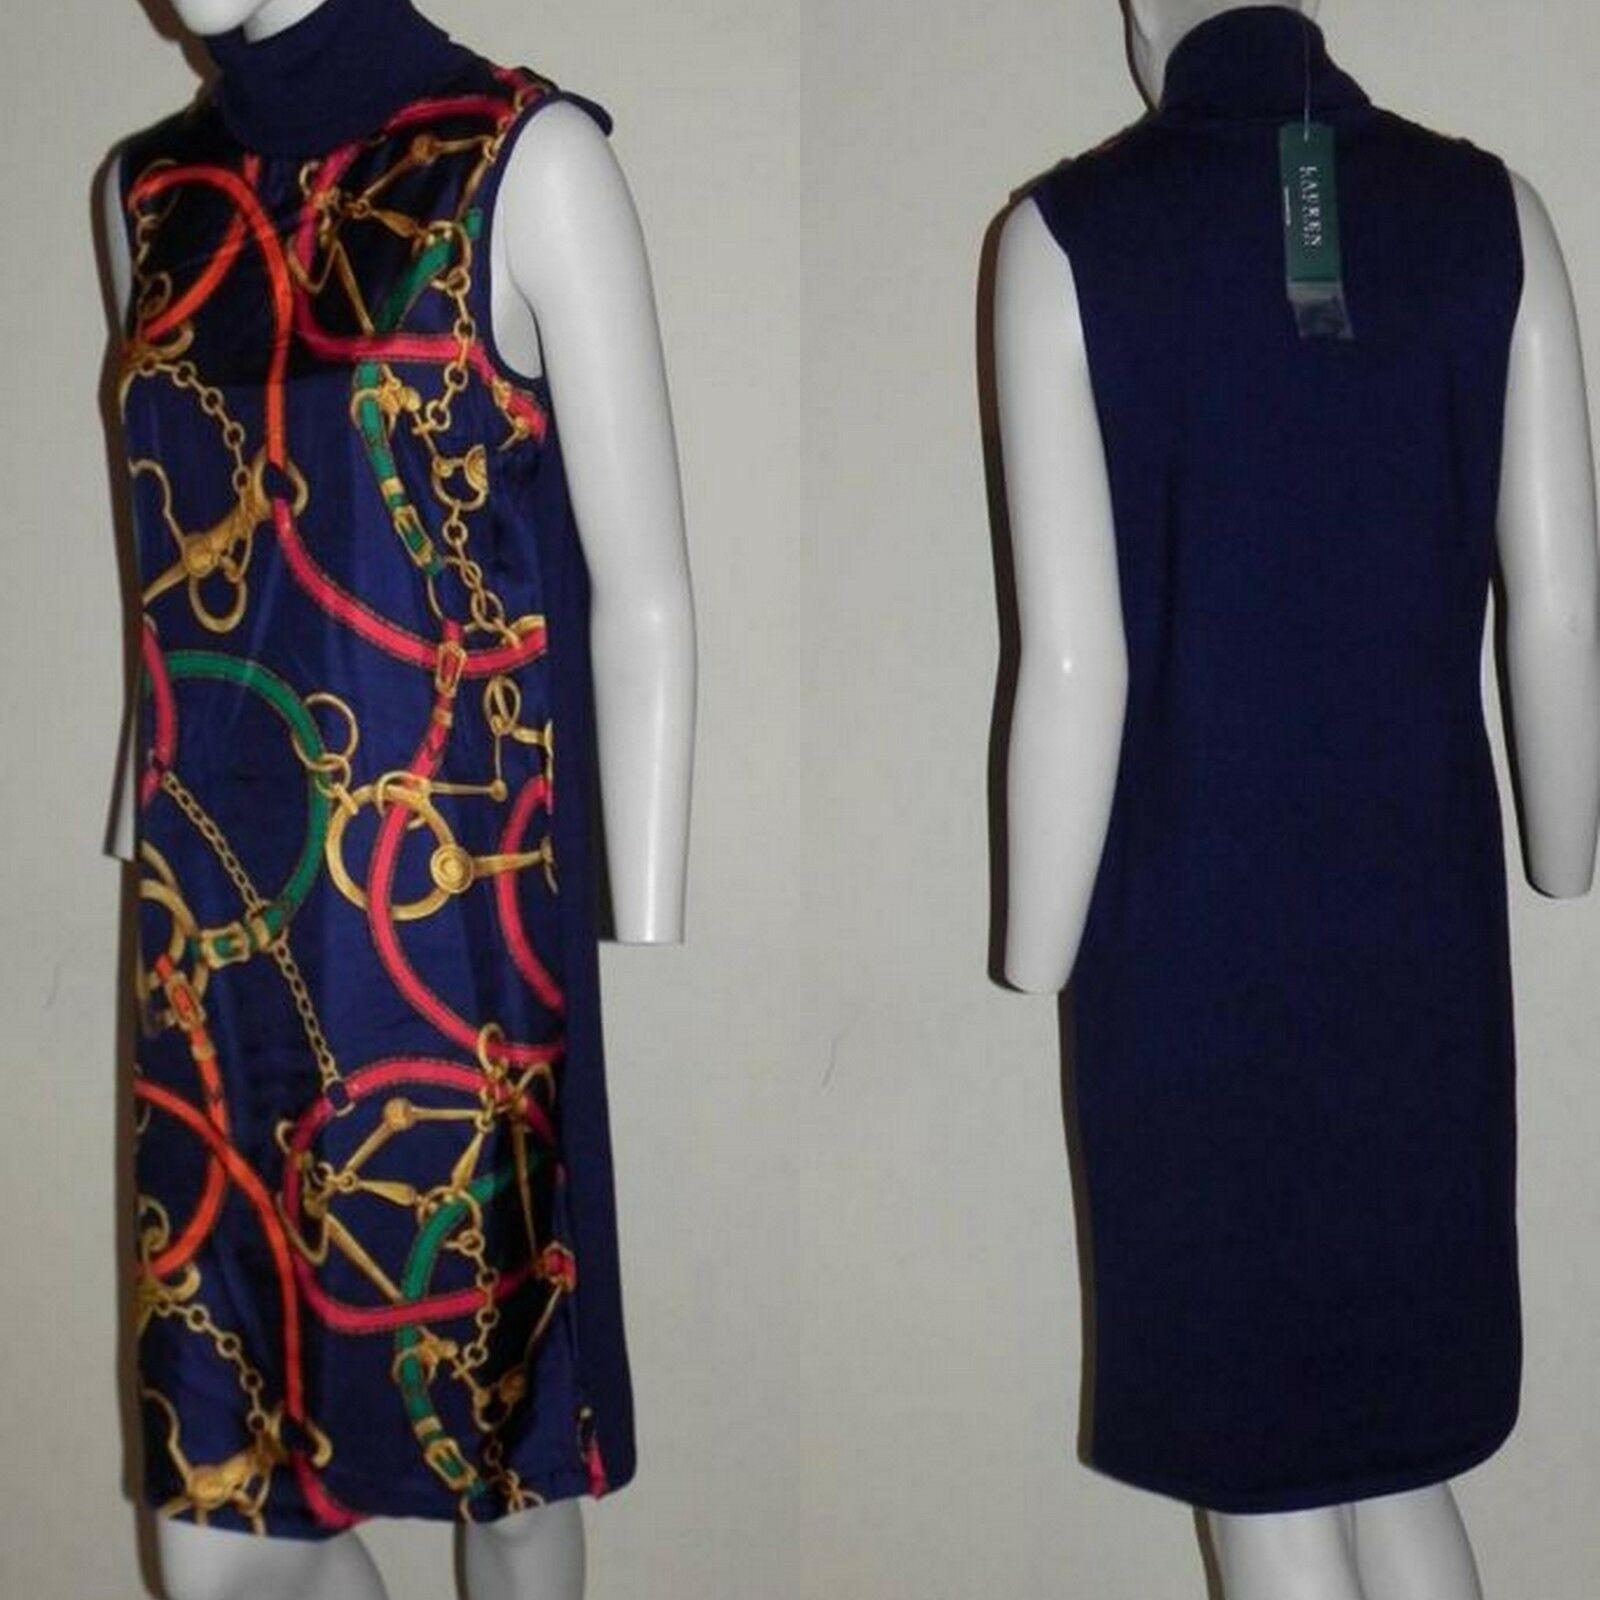 Lauren Ralph Lauren Turtleneck Equestrian Navy Multi Farbe Sheath Dress L